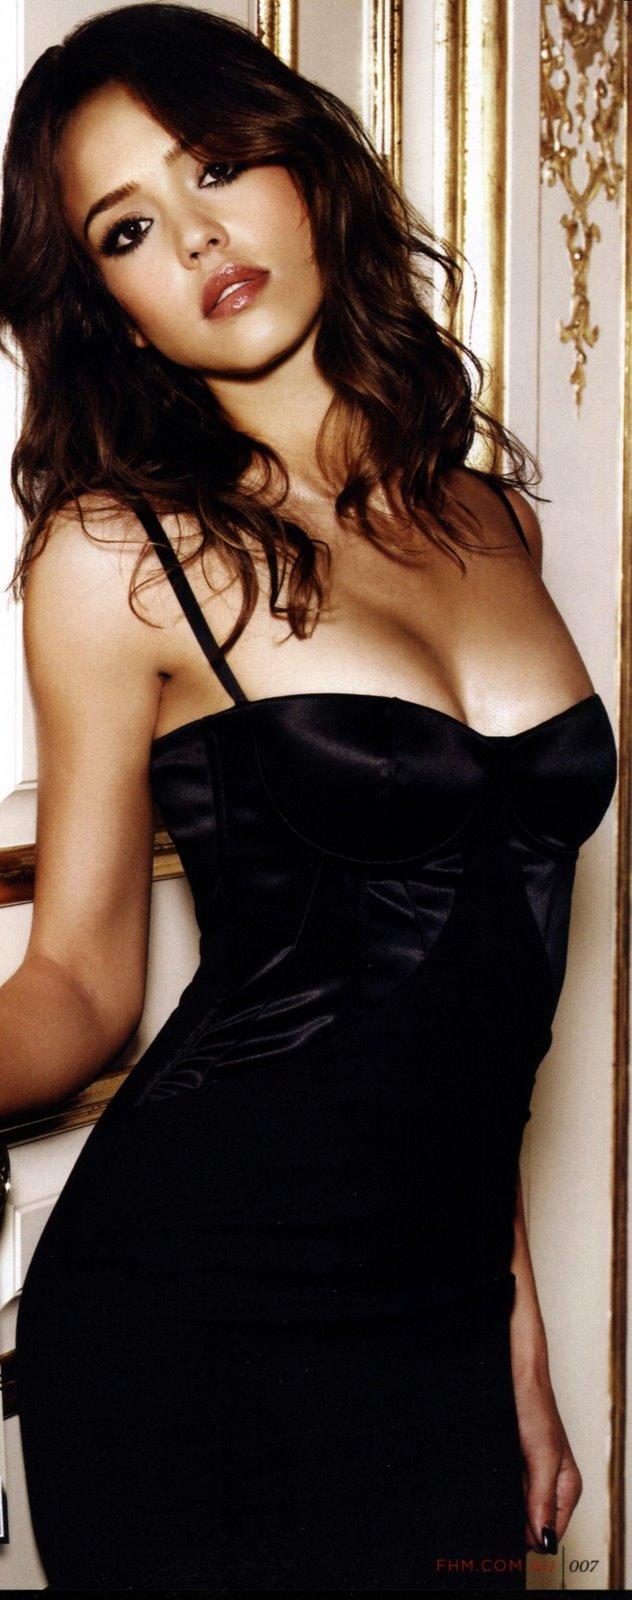 Jessica Alba Lingerie Pics 90